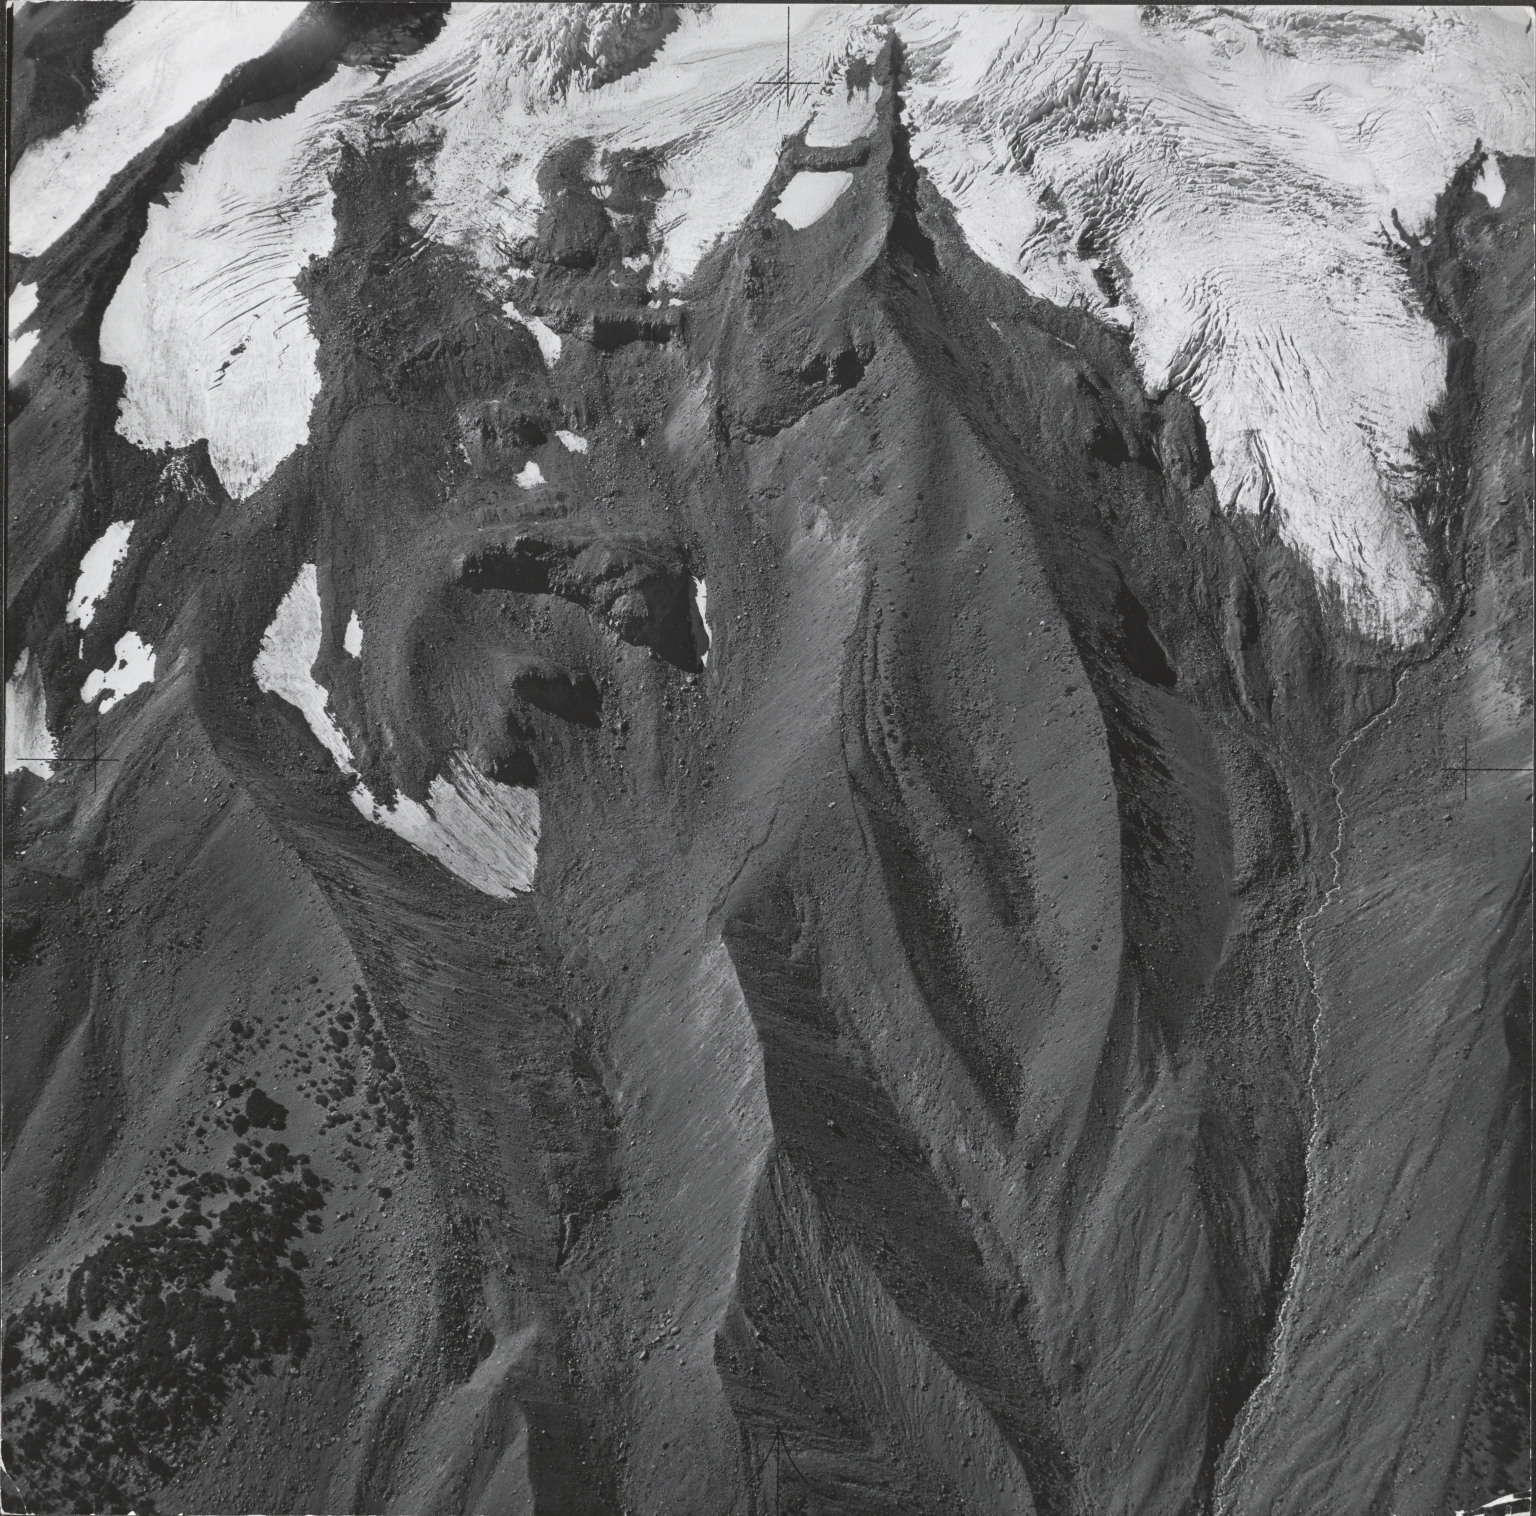 Whitewater Glacier, aerial photograph roll no. 21 exposure no. 38, Oregon